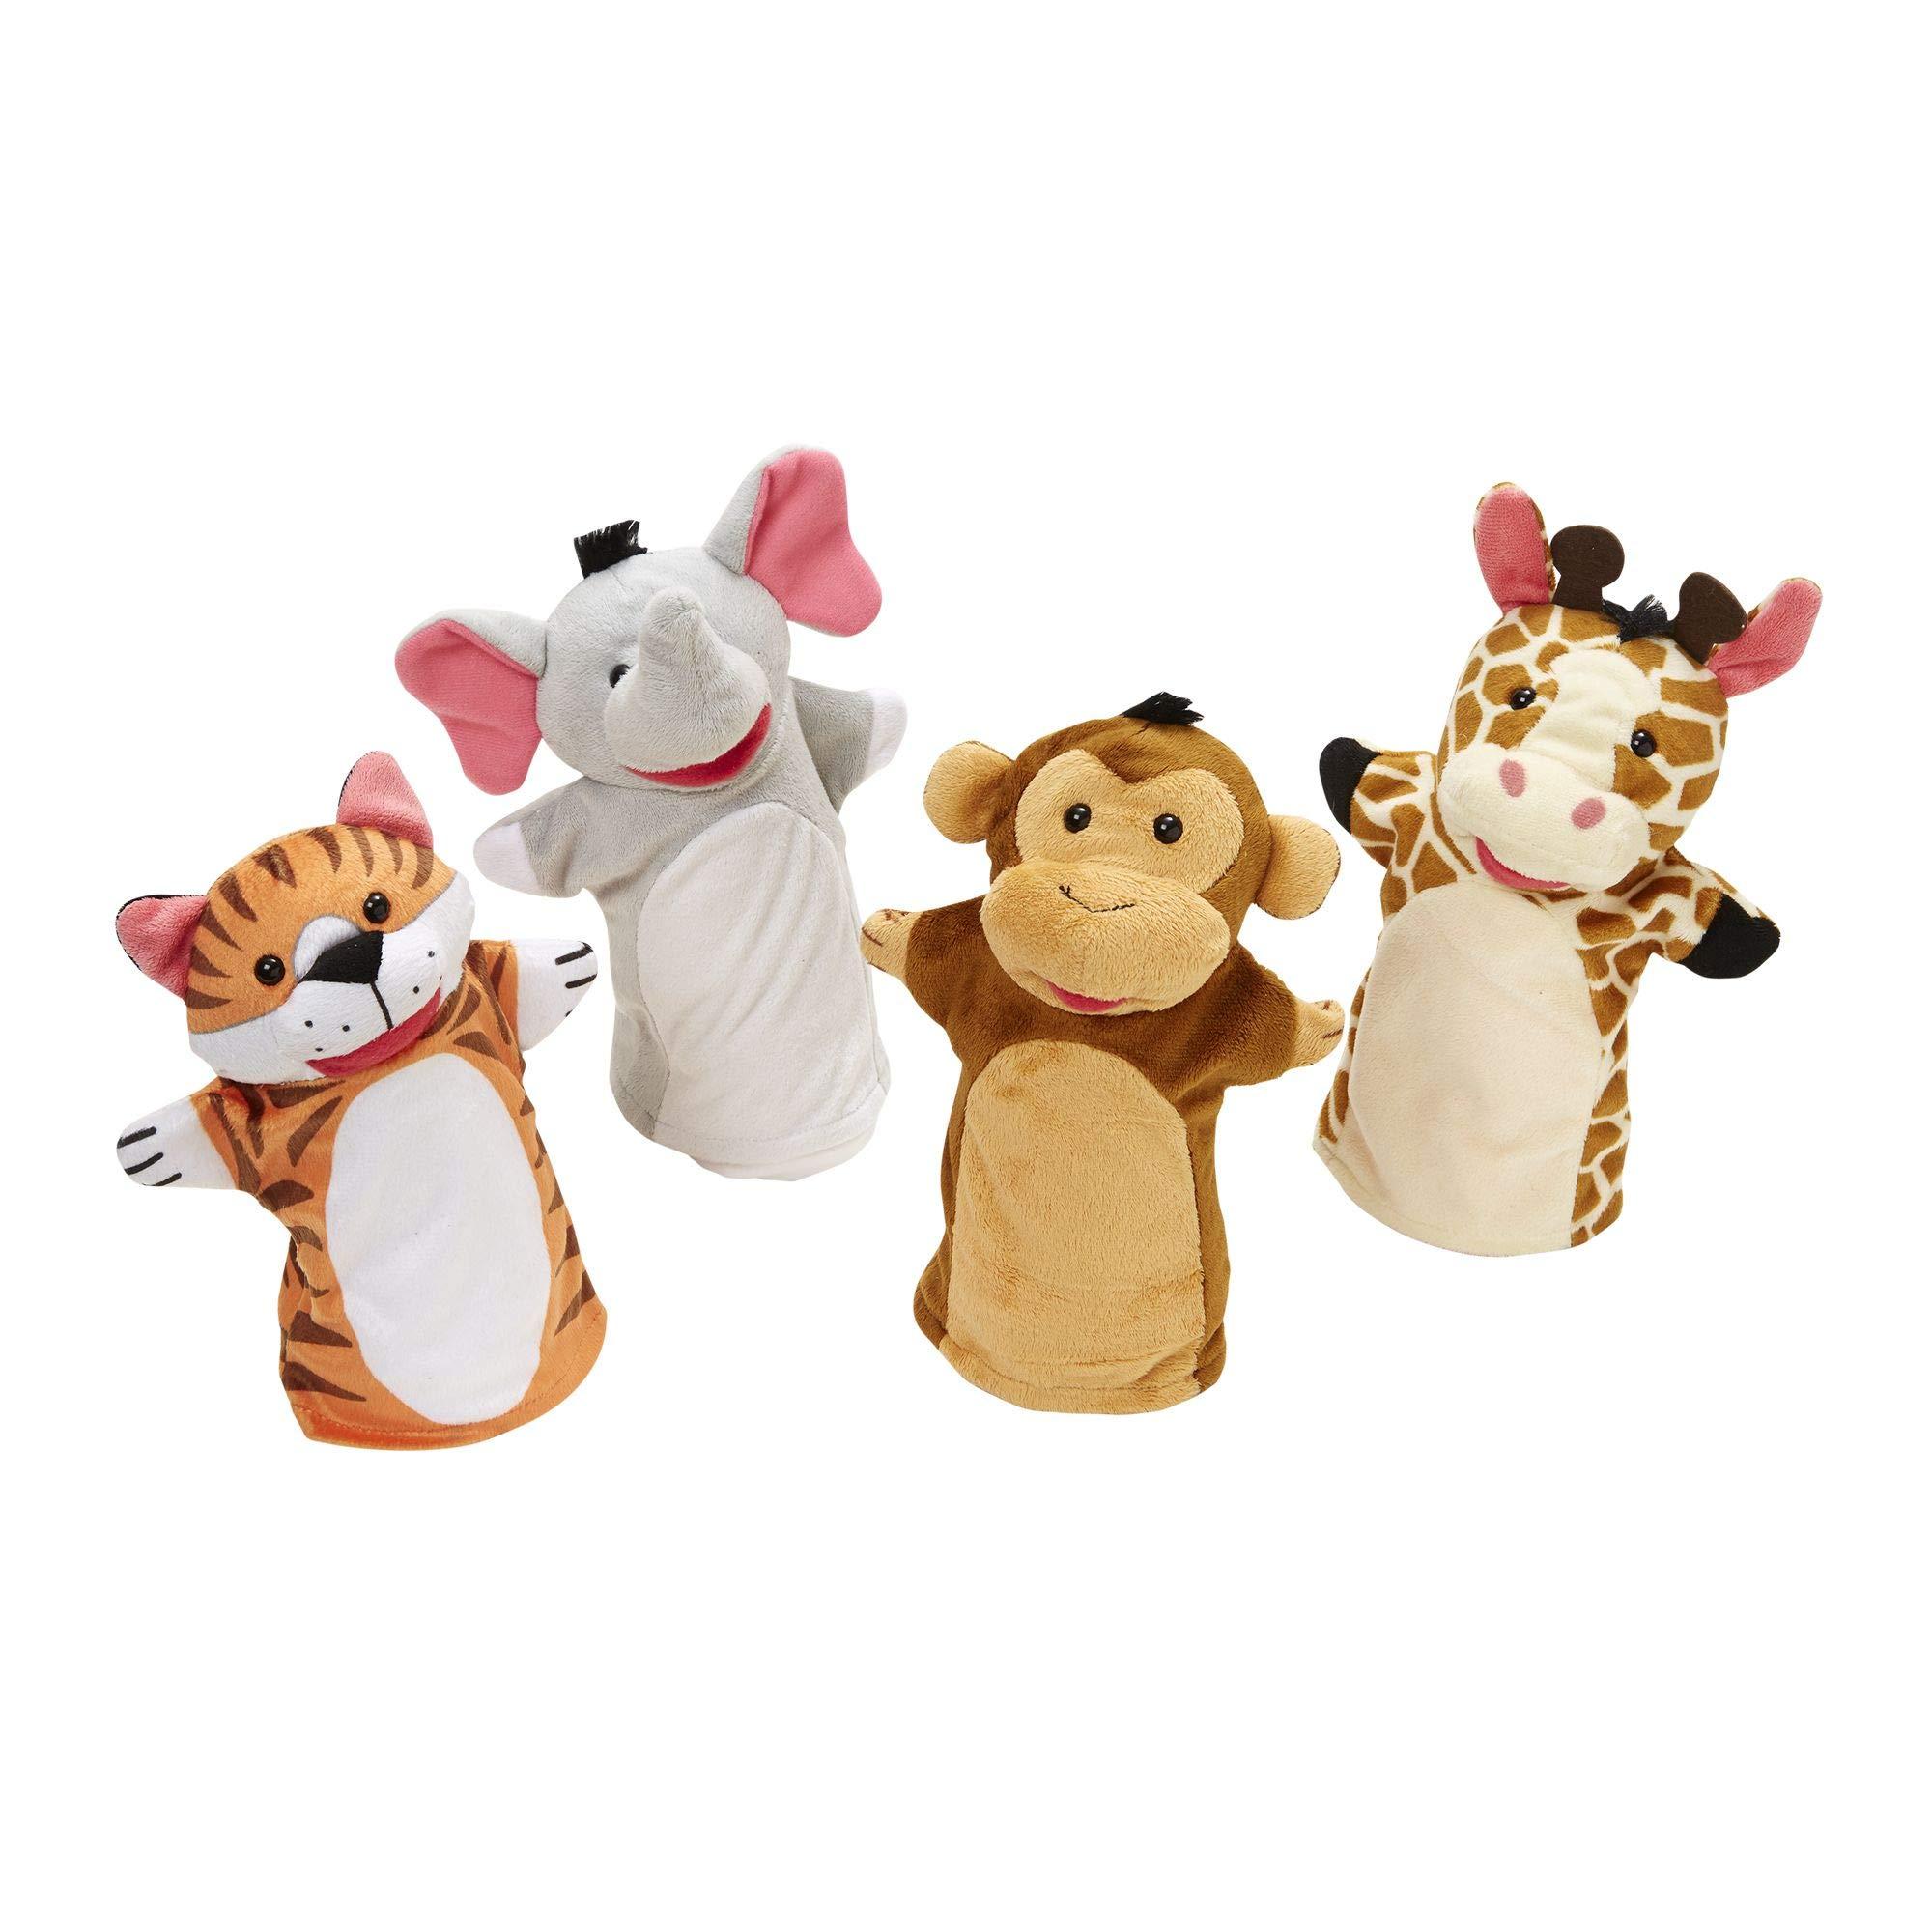 "Melissa & Doug Zoo Friends Hand Puppets, Puppet Sets, Elephant, Giraffe, Tiger, & Monkey, Soft Plush Material, Set of 4, 14"" H X 8.5"" W X 2"" L"